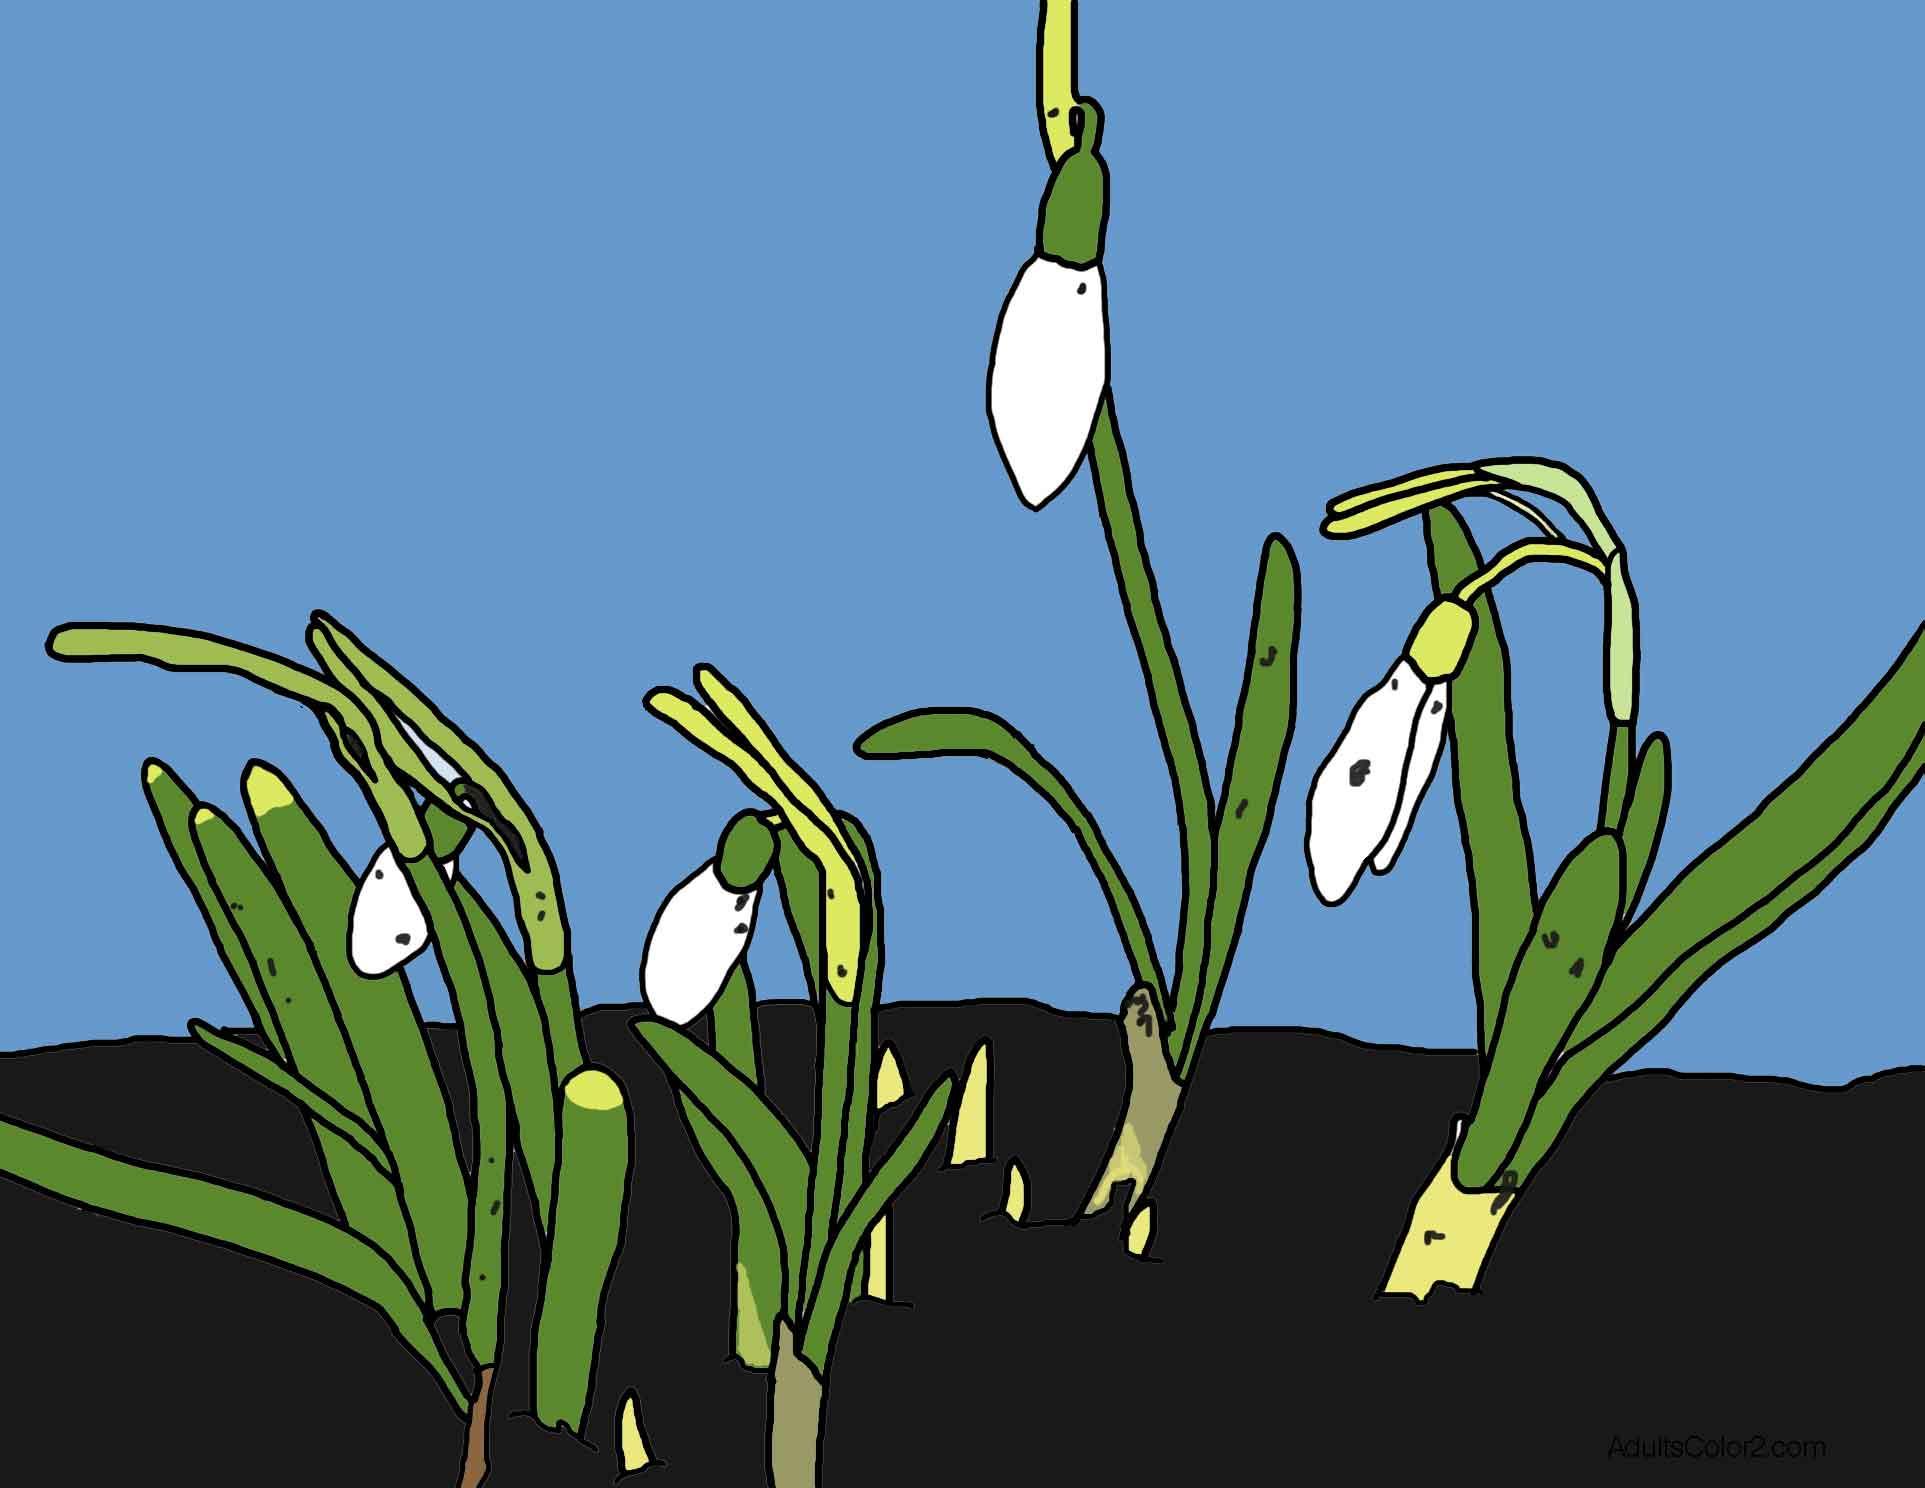 Snowdrop flowers scene.